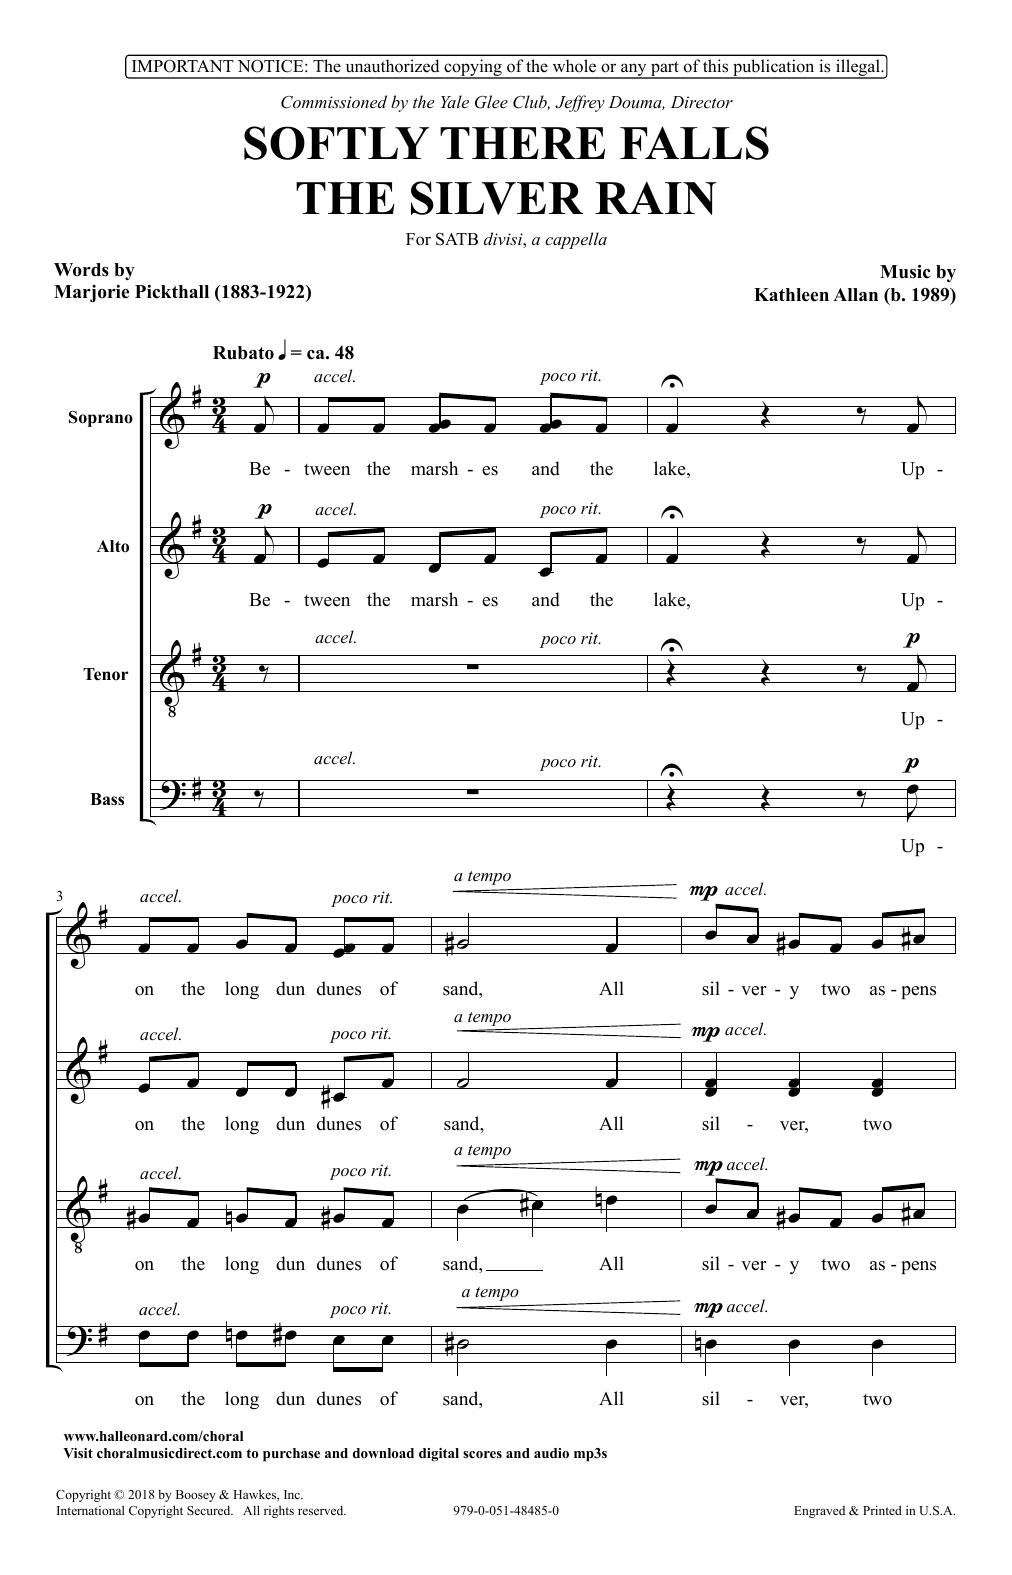 Softly There Falls The Silver Rain (SATB Choir)